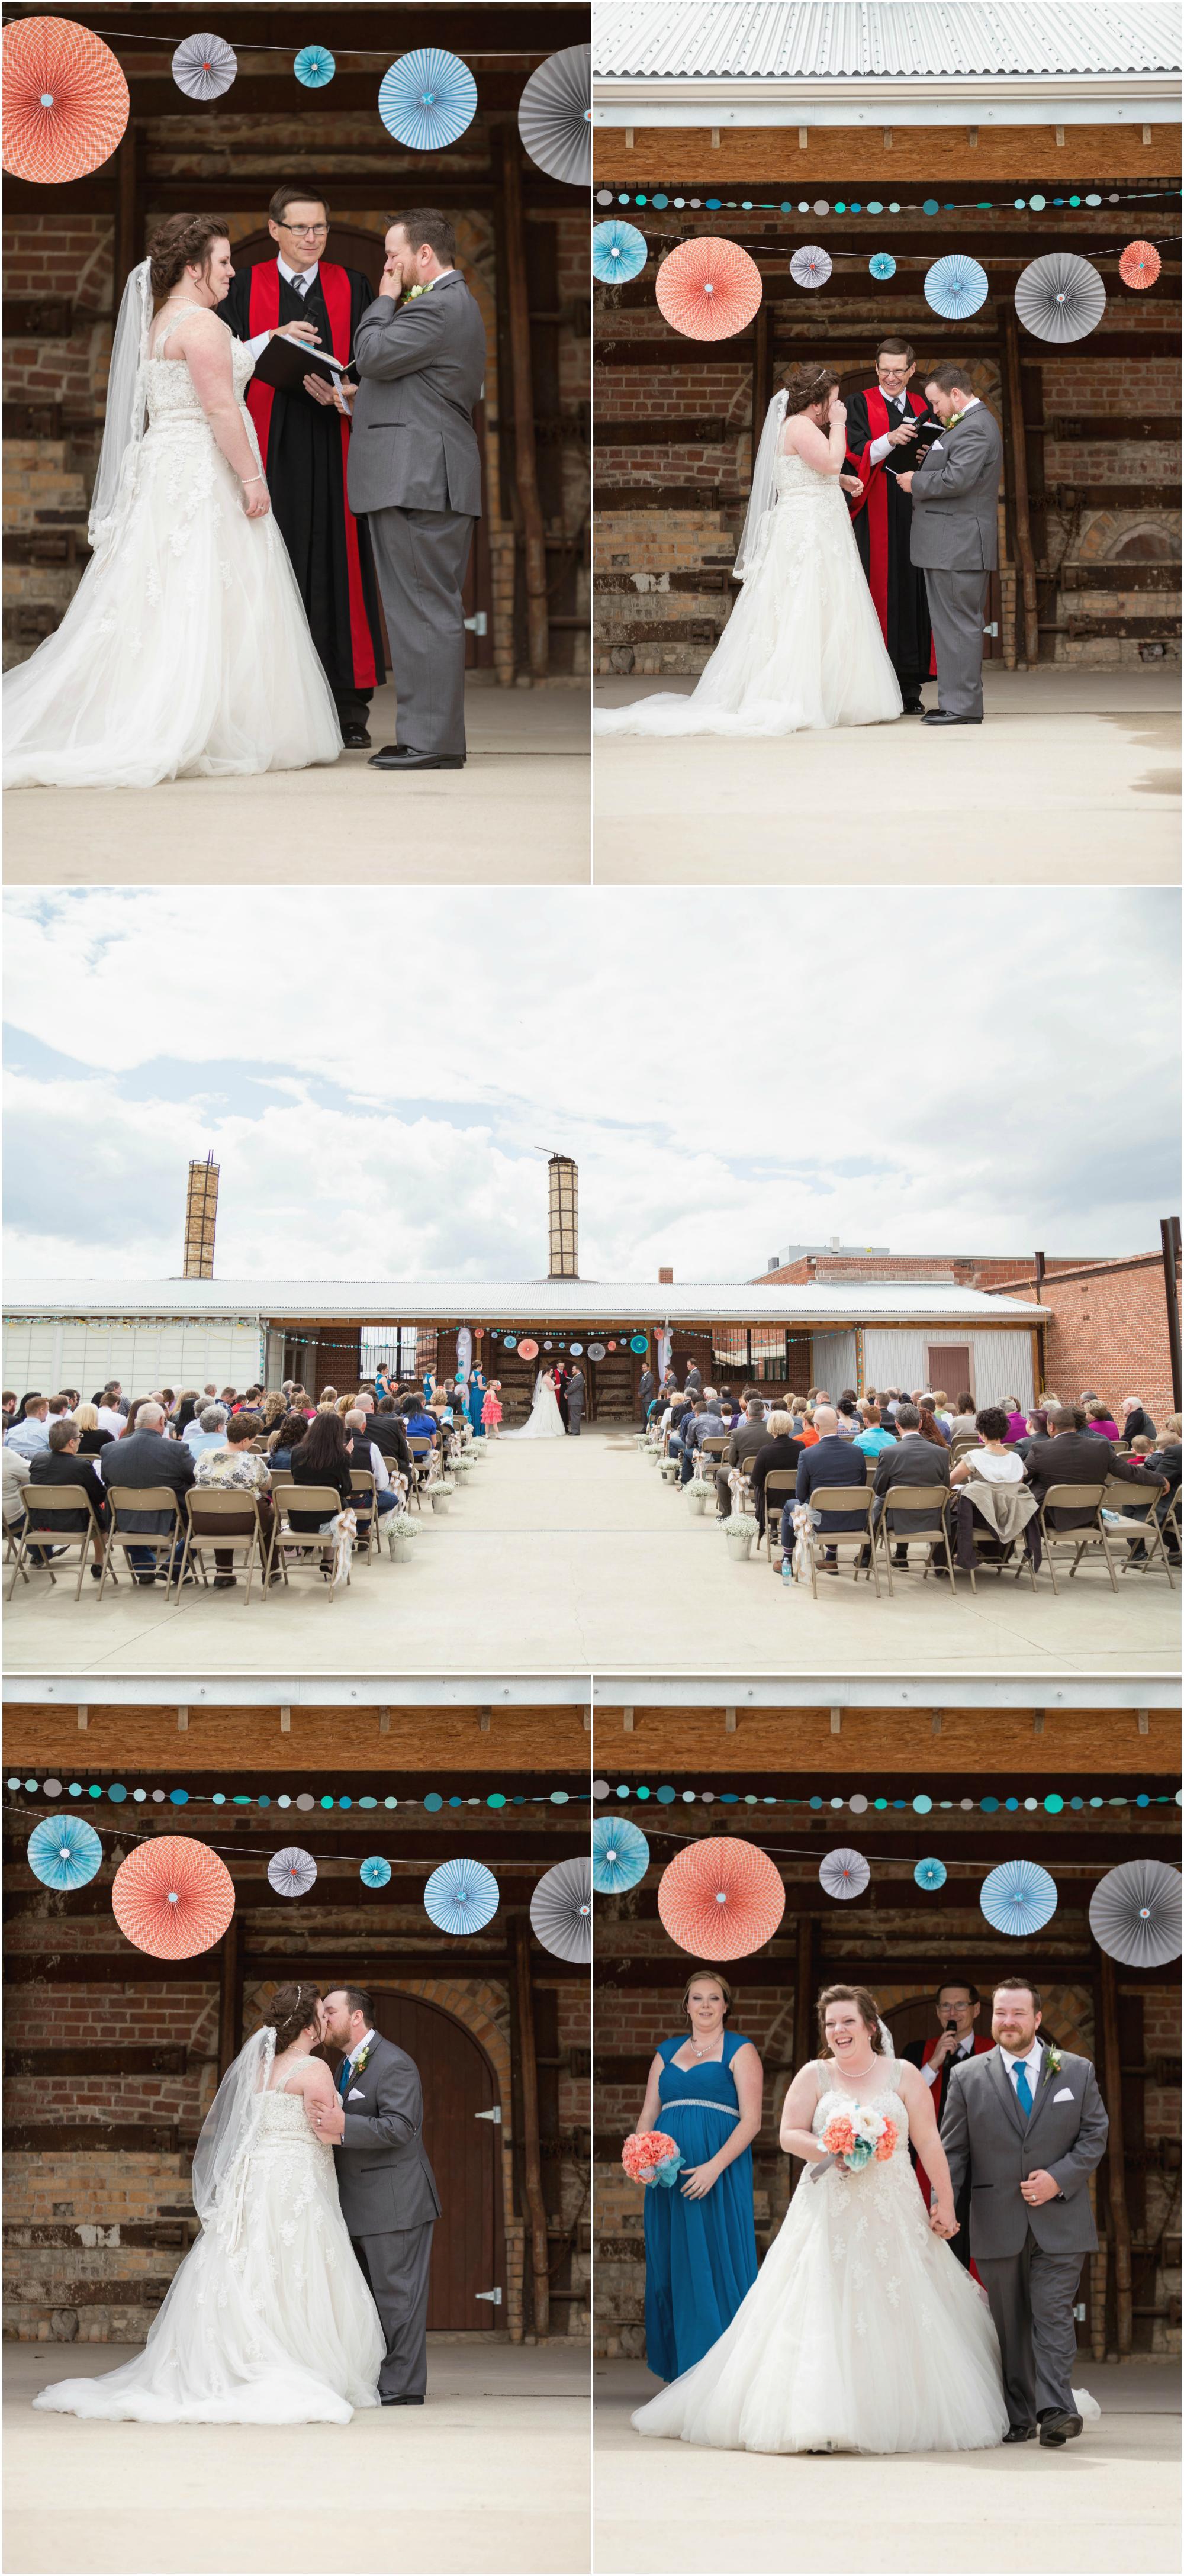 medalta_wedding_medicine_hat_07.png